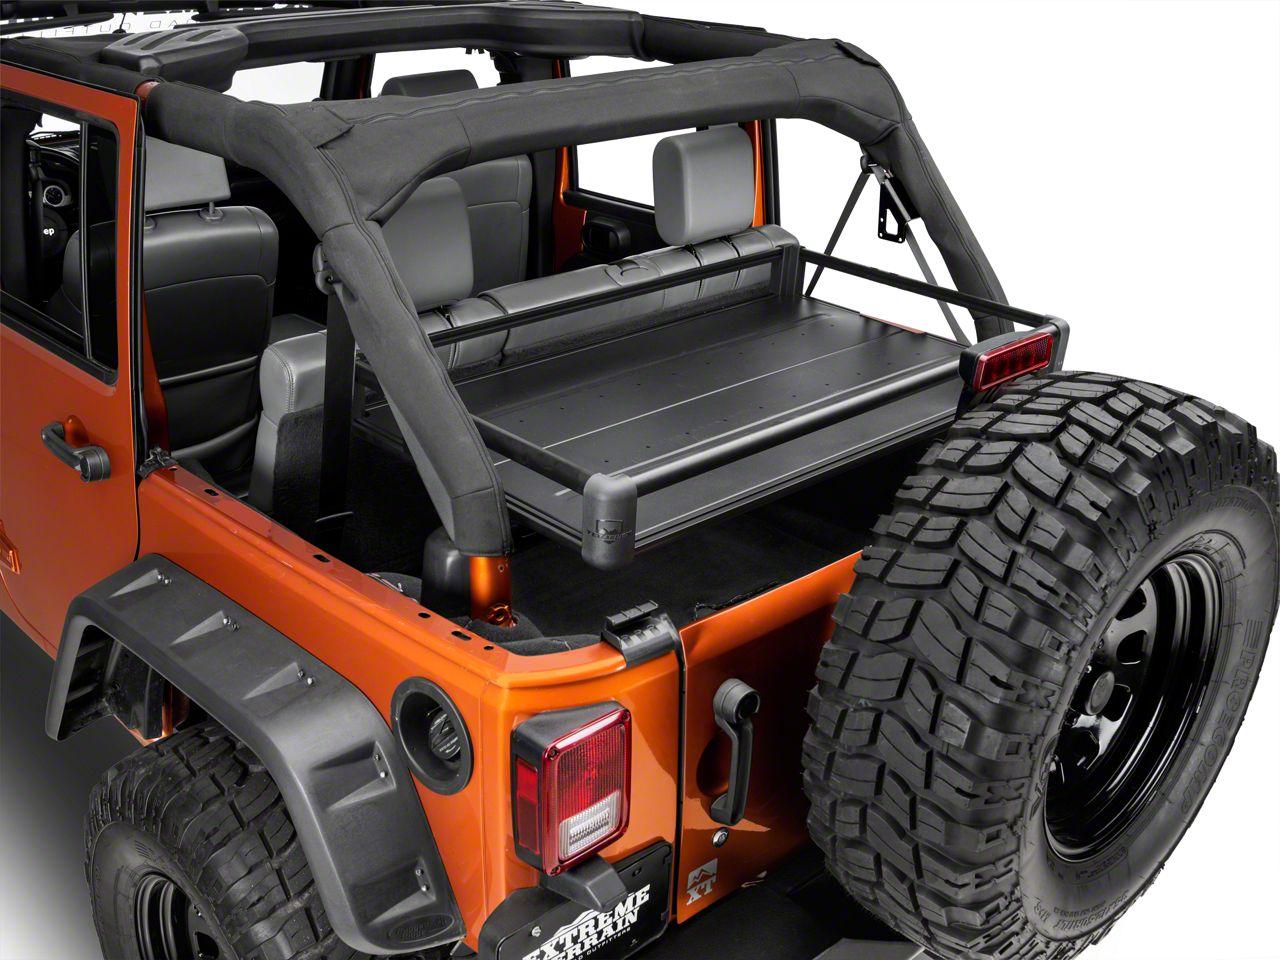 Teraflex Rear Utility Cargo Rack - Black (07-18 Jeep Wrangler JK 4 Door)